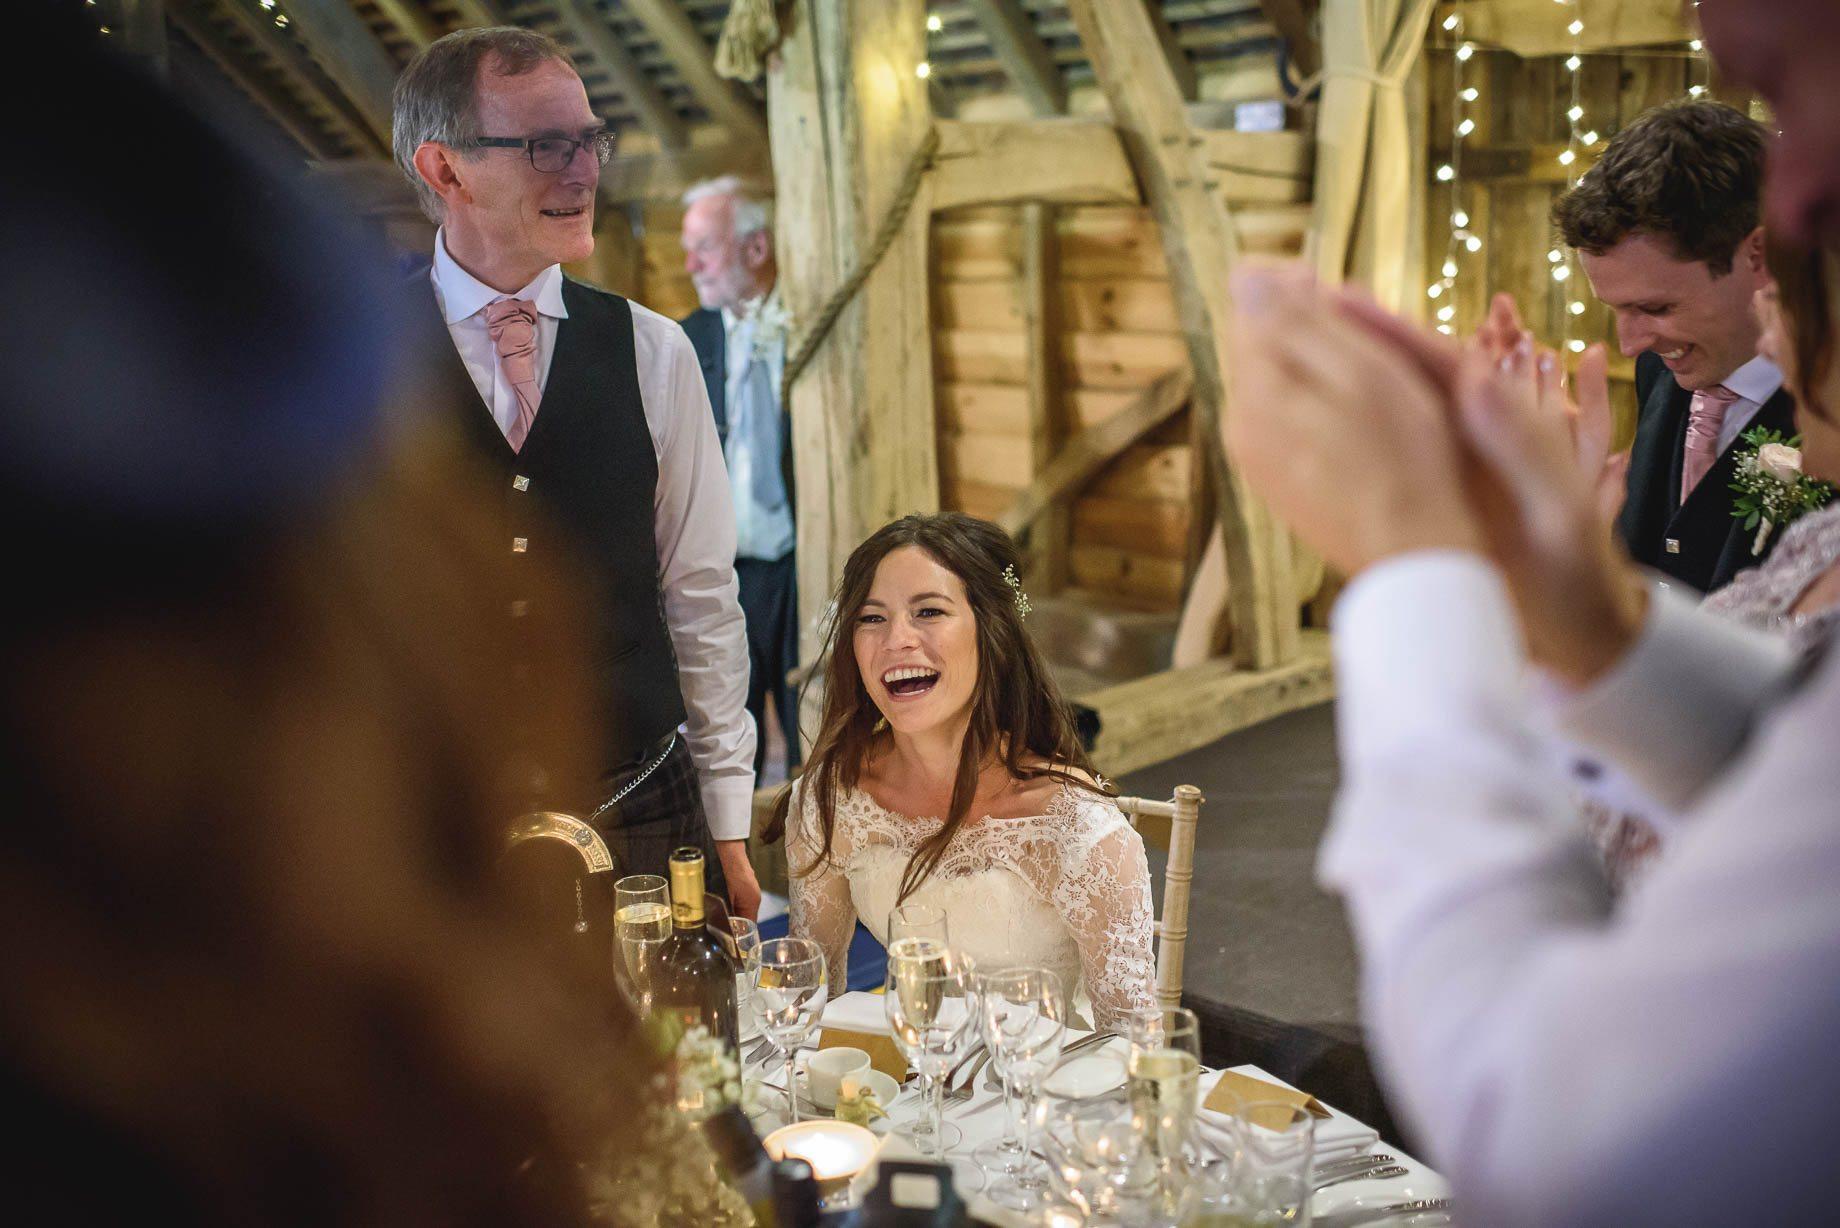 Gildings Barn wedding photography - Sarah and Steve (130 of 190)